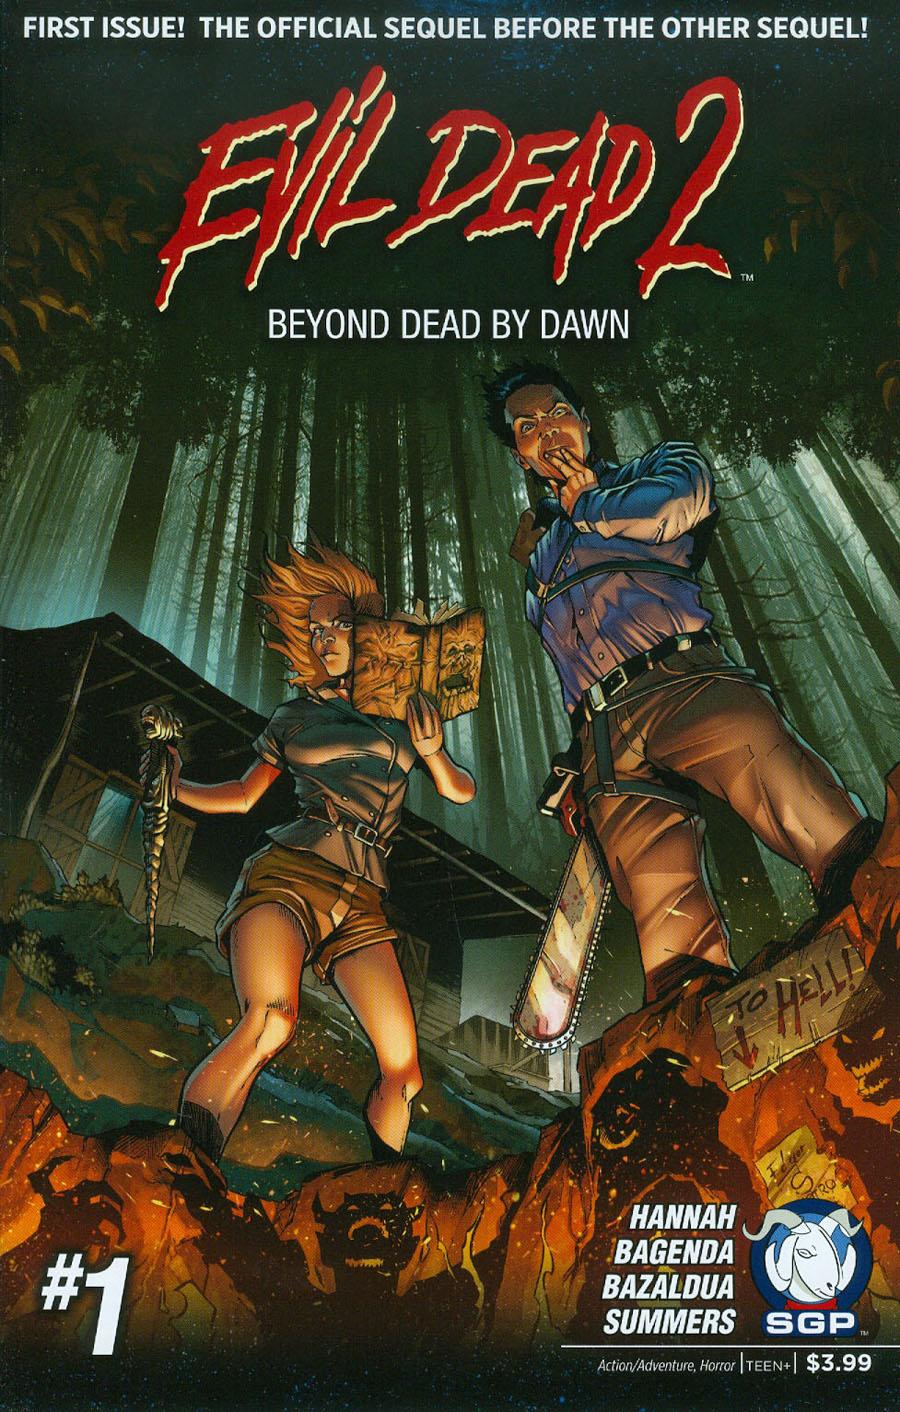 Evil Dead 2 Beyond Dead By Dawn #1 Cover A Regular Edition